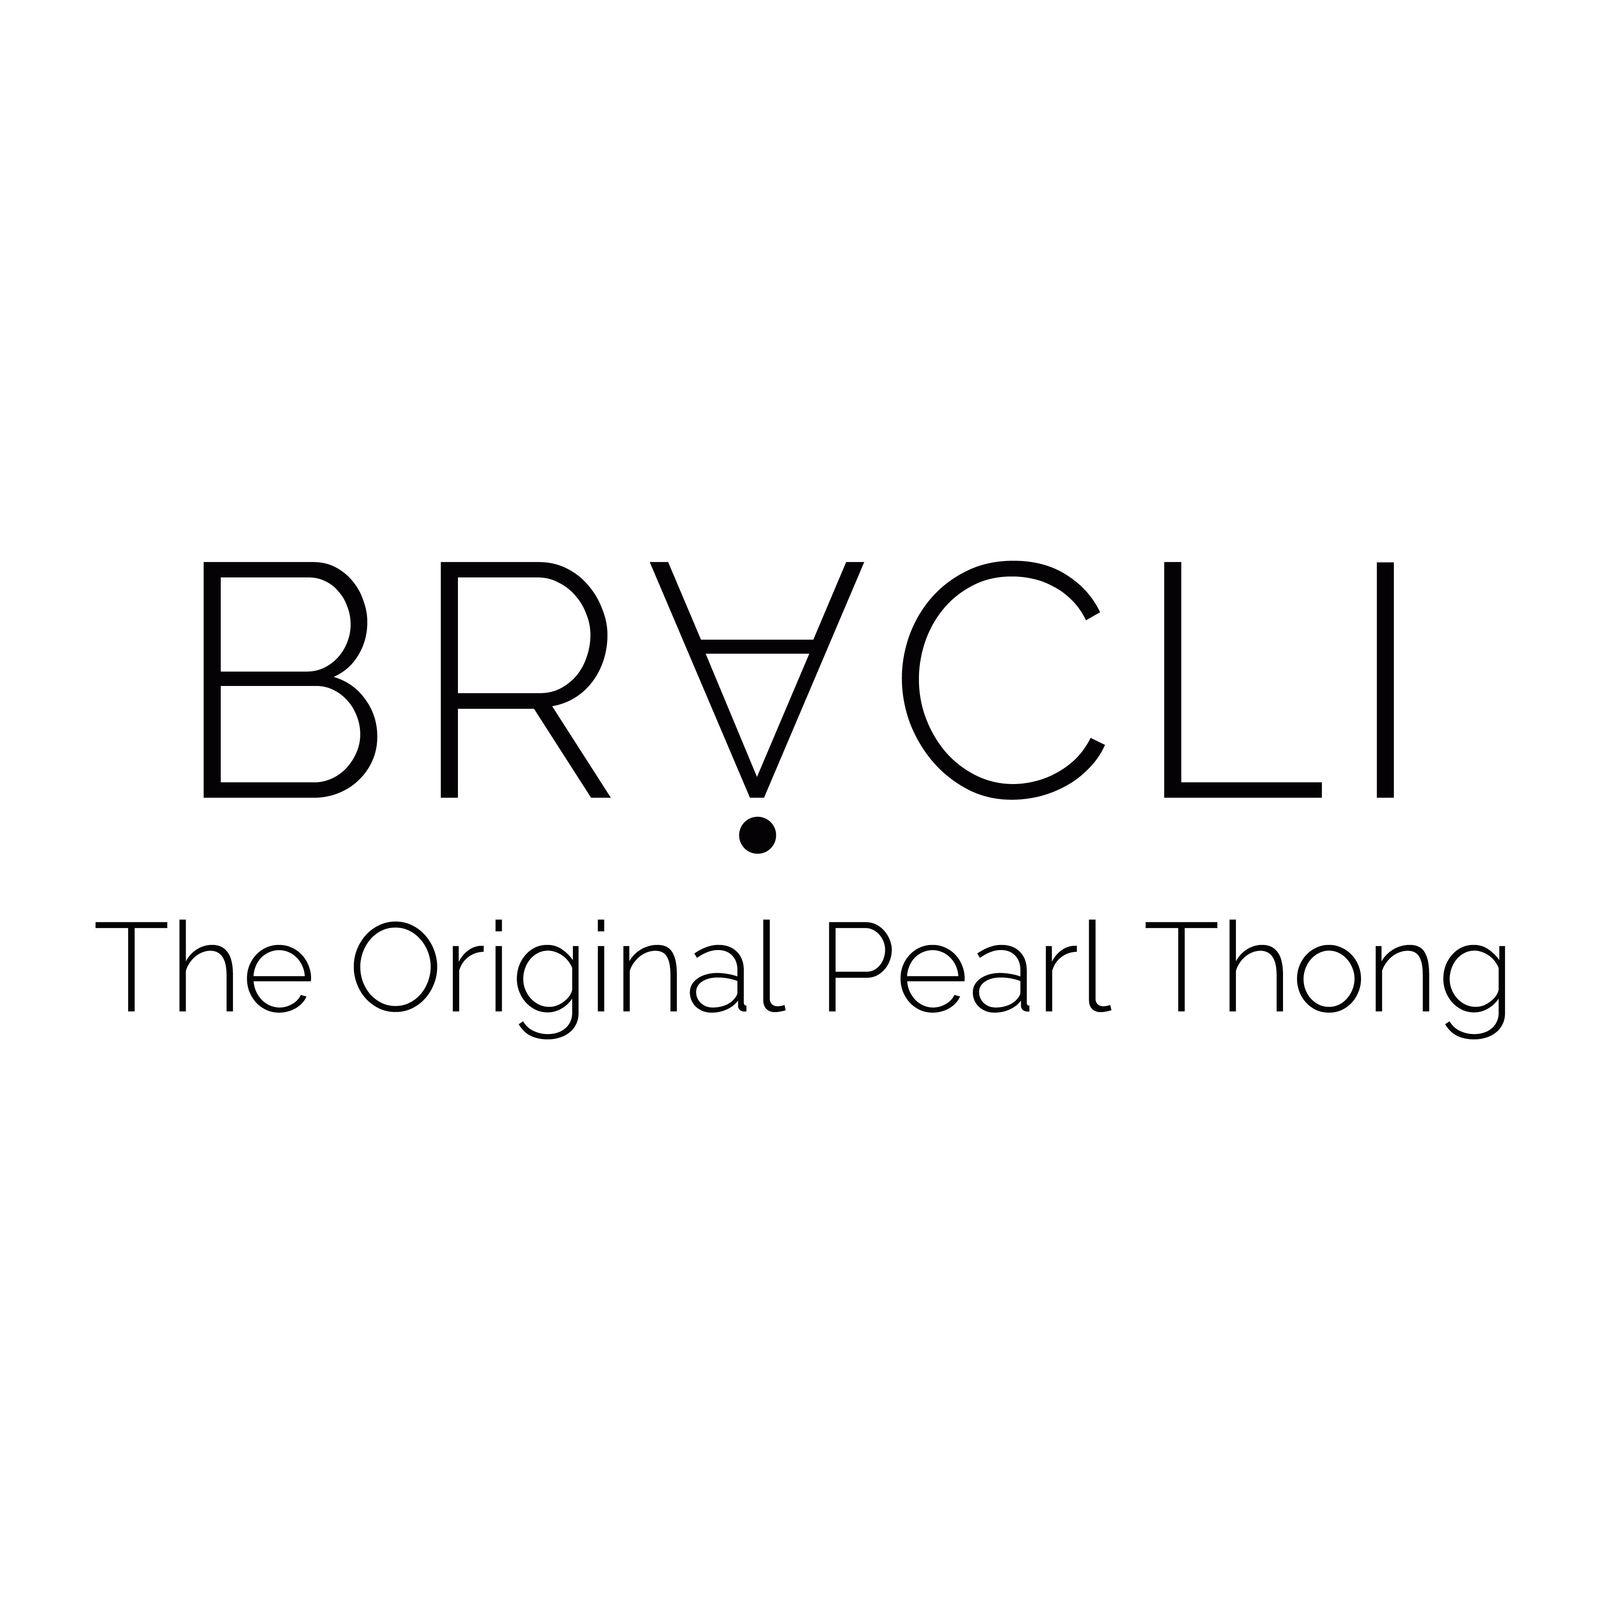 Bracli®